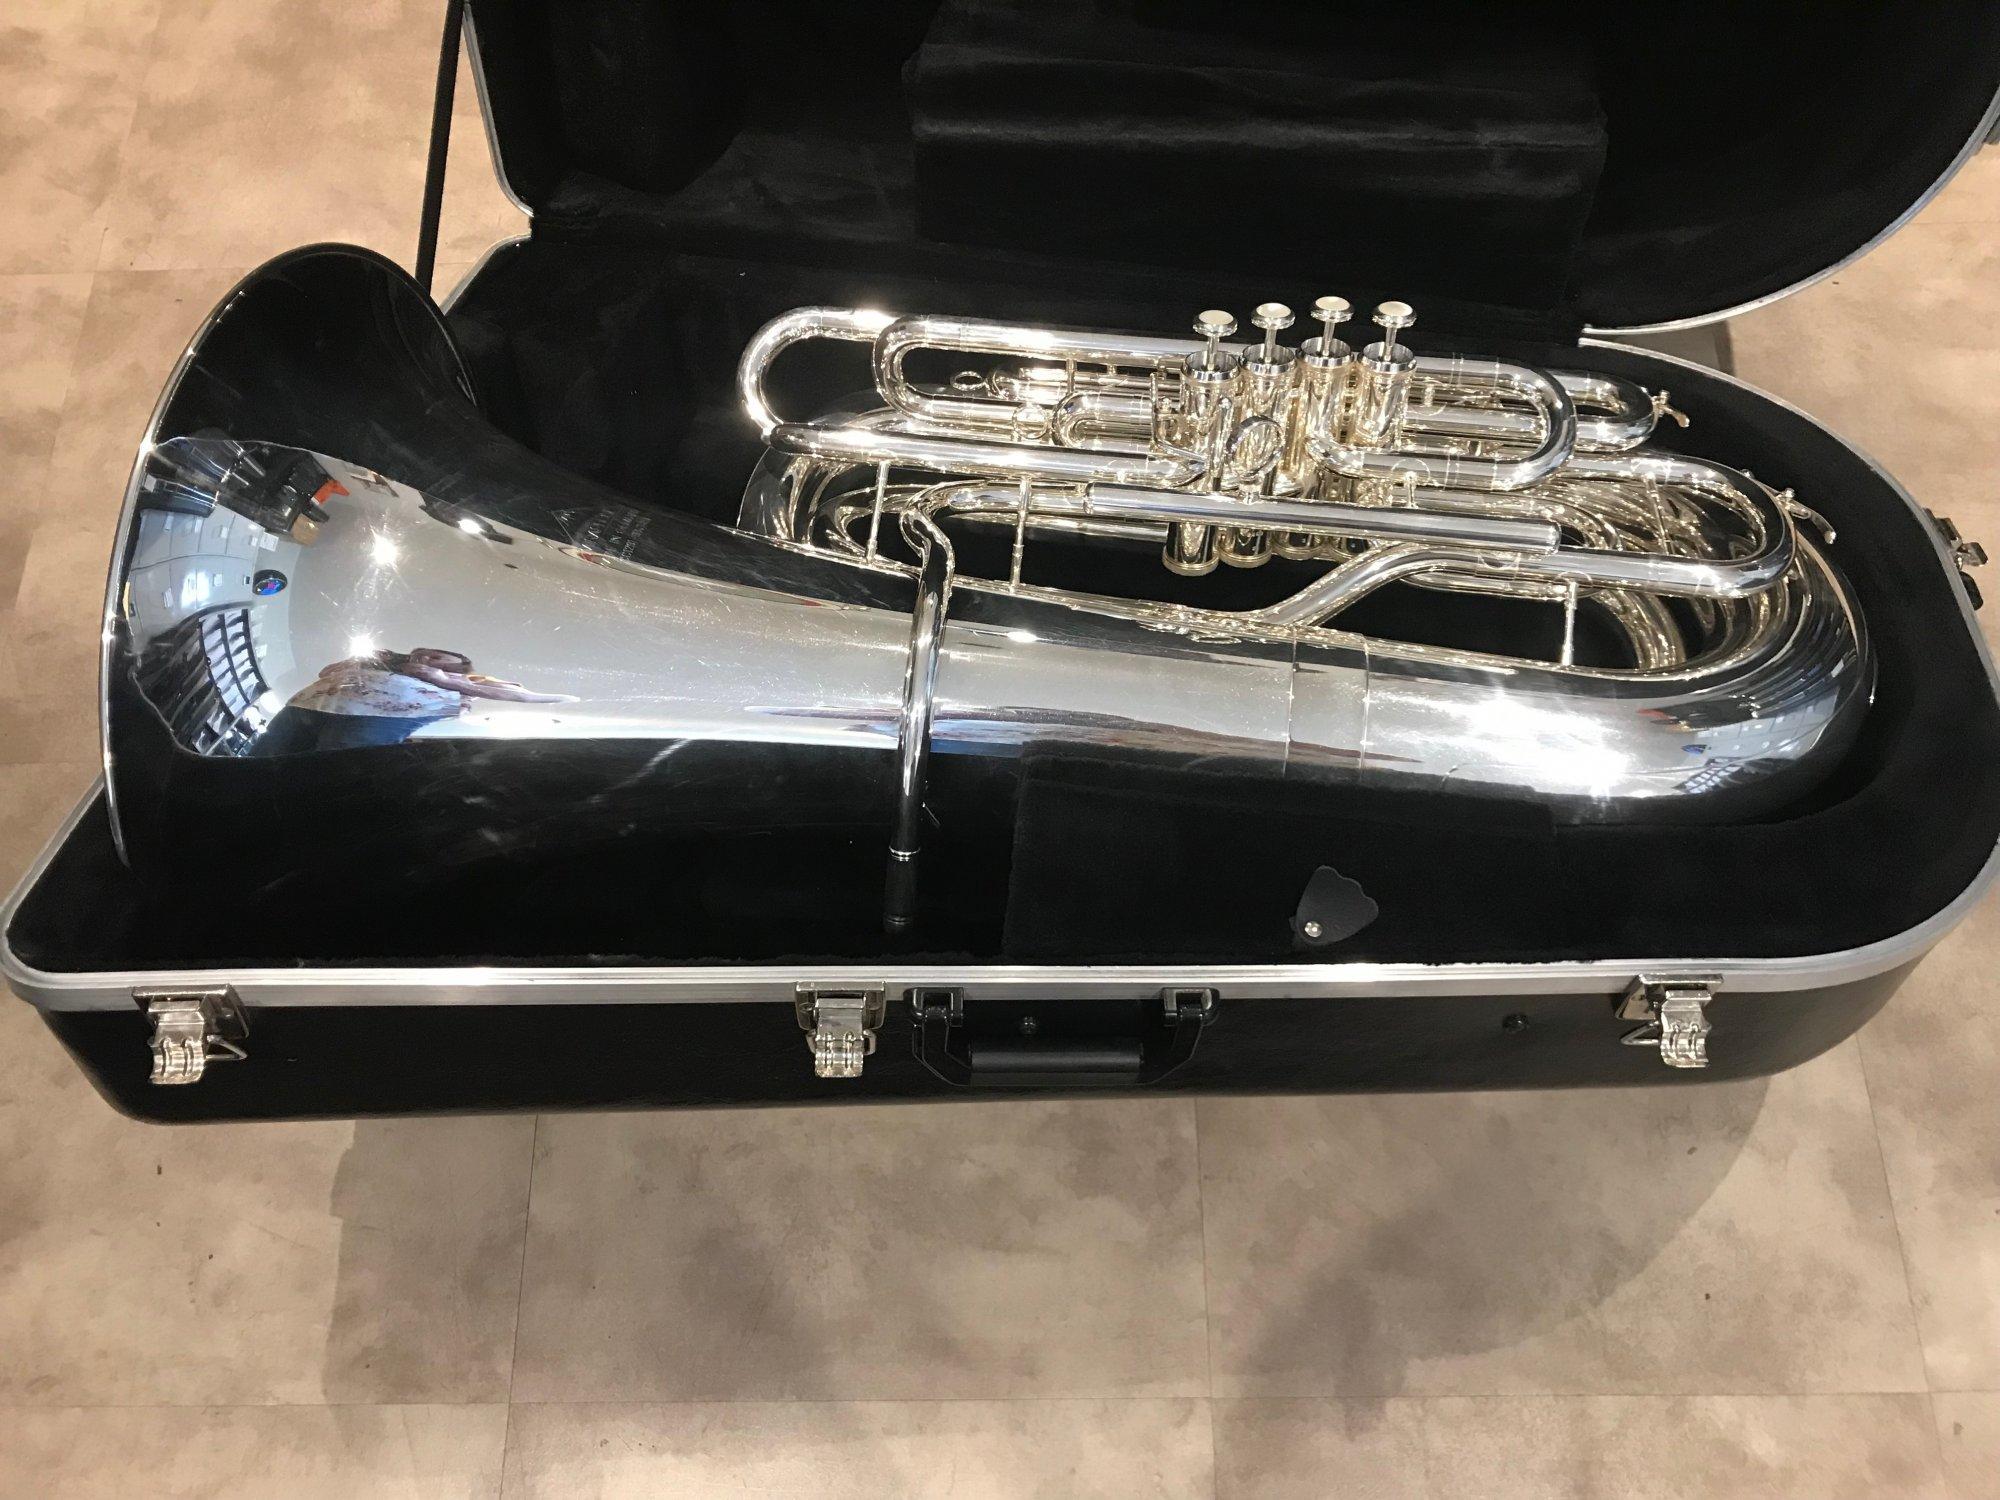 Miraphone 1291 4V 1R Tuba - Consignment